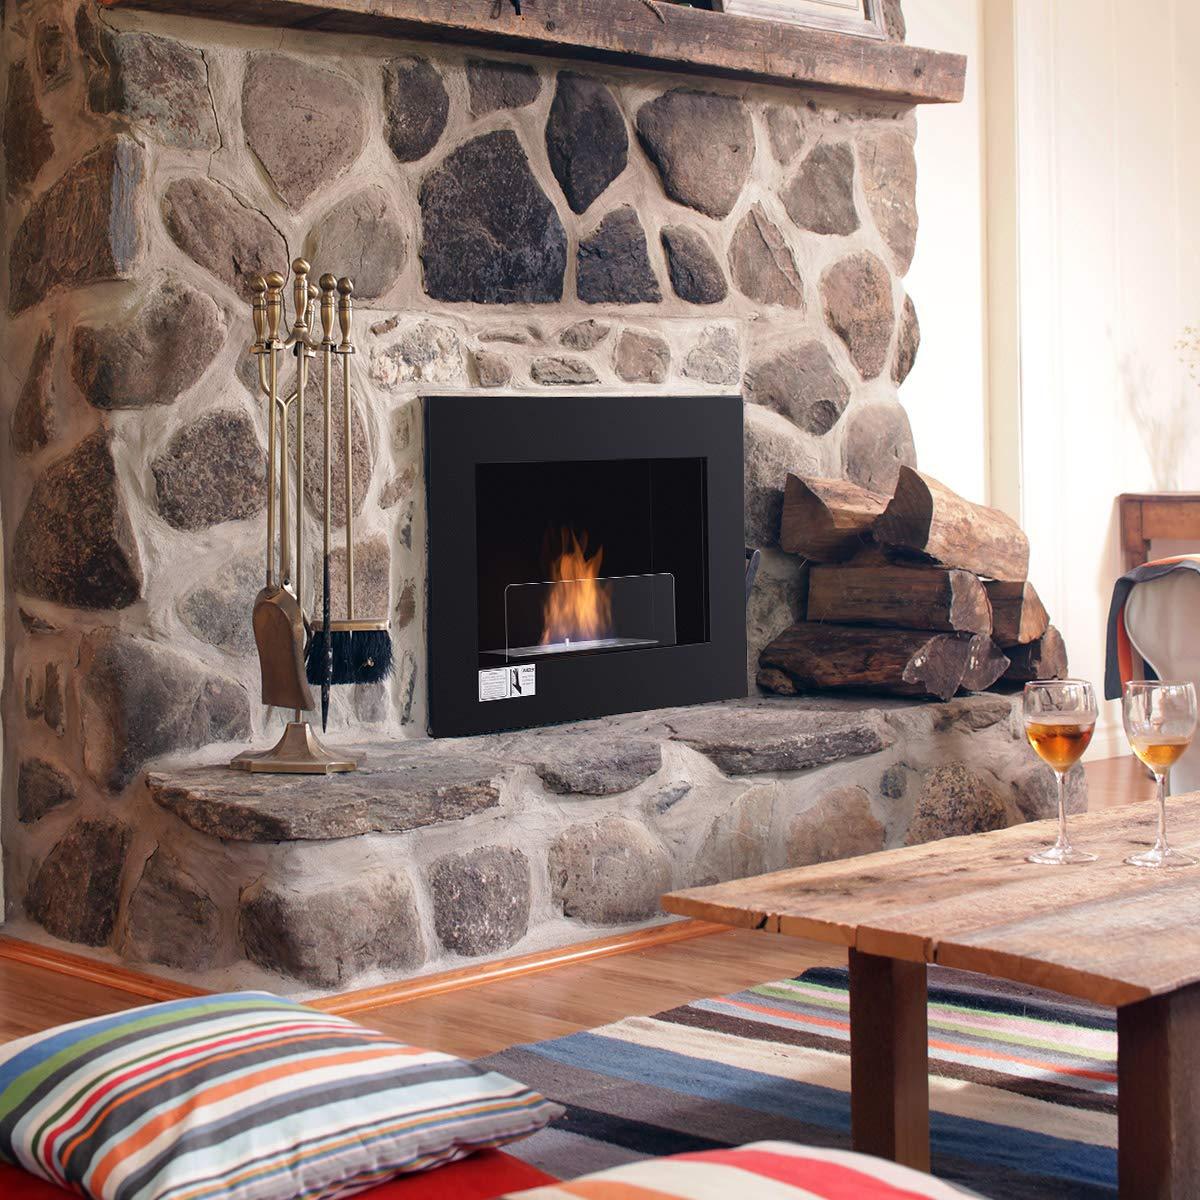 Tangkula 27.5/'/' Wall Mounted Bio-Ethanol Fireplace Ventless Hanging Fireplace Burner Tabletop Fireplace